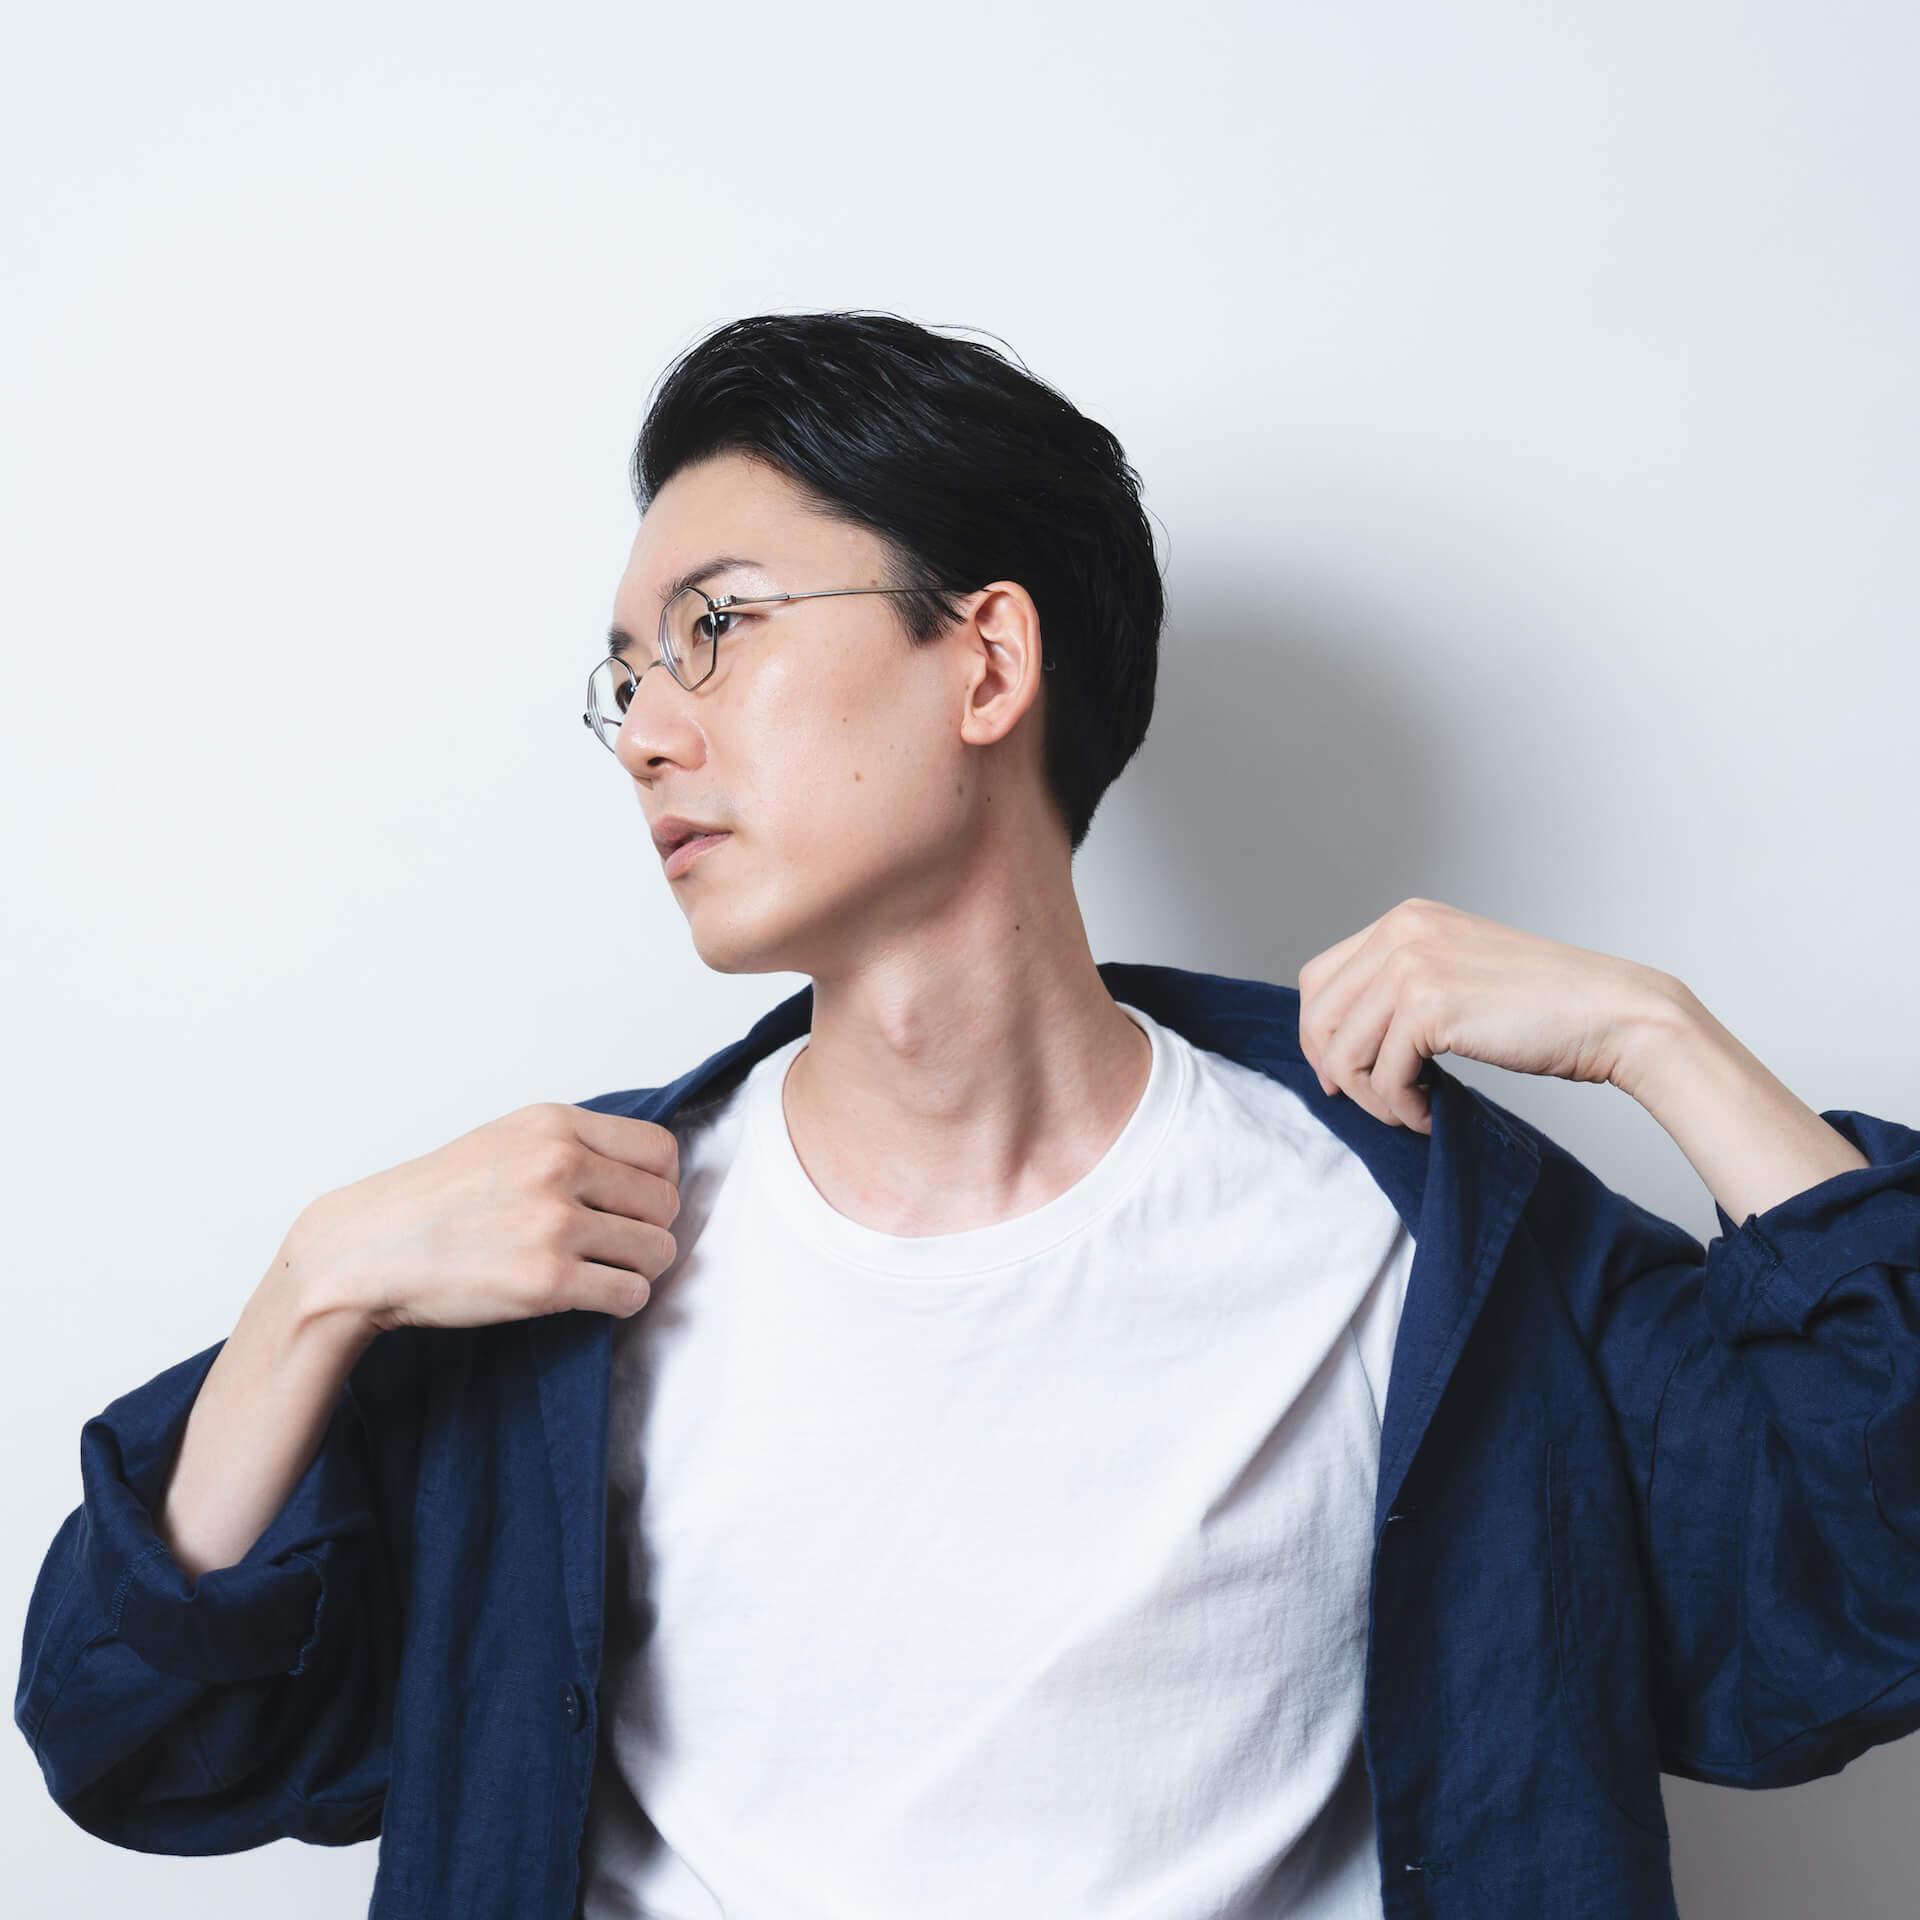 Kan Sano、Michael Kaneko、mabanuaらが出演する<origami SAI 2020 Tokyo>の配信チケットが発売決定!会場チケットの追加販売&Hiro-a-keyのゲスト出演も music210122_origamisai_2